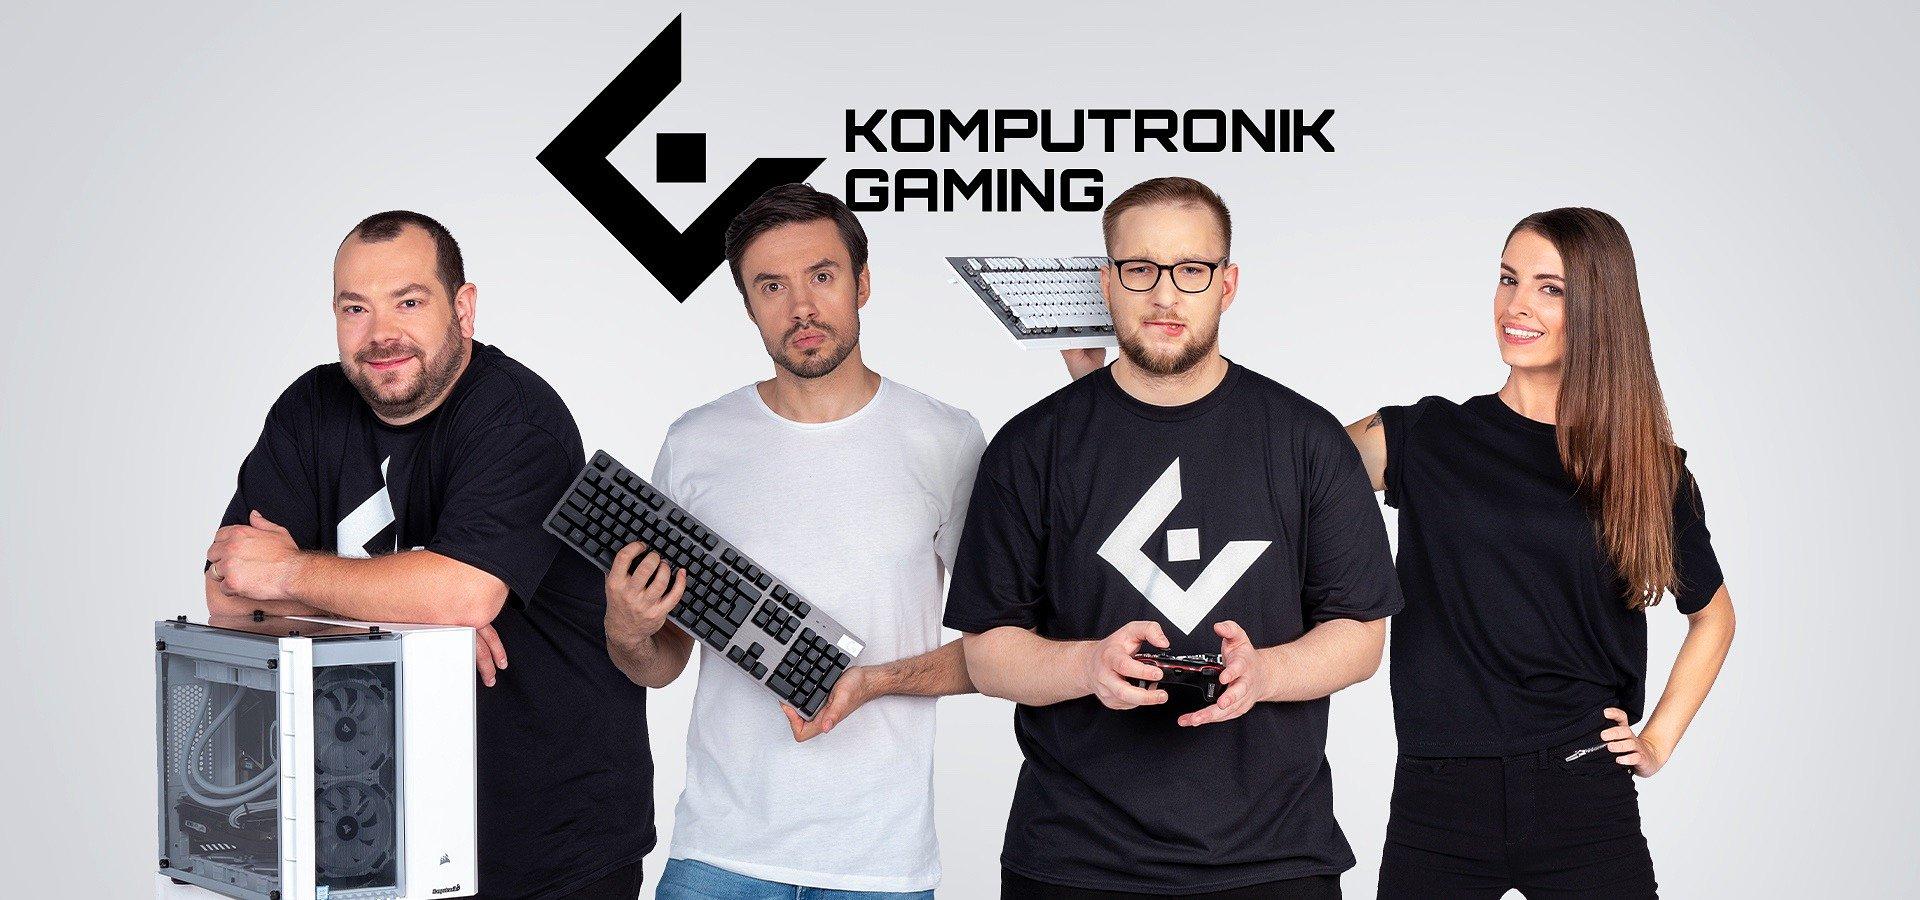 Nowe twarze w Ekipie Komputronik Gaming!